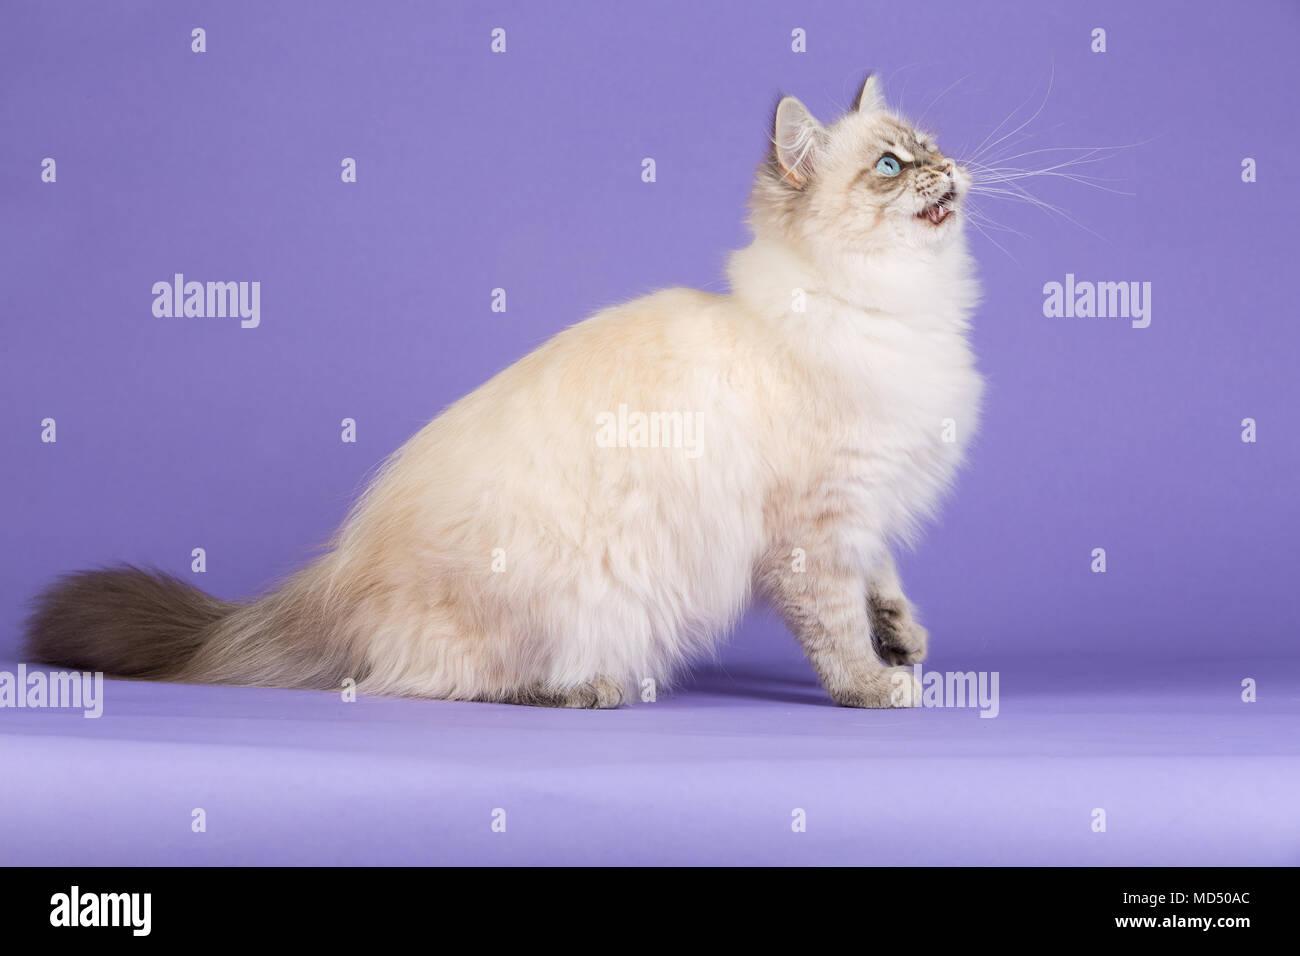 Playful Siberian cat sitting on purple - Stock Image